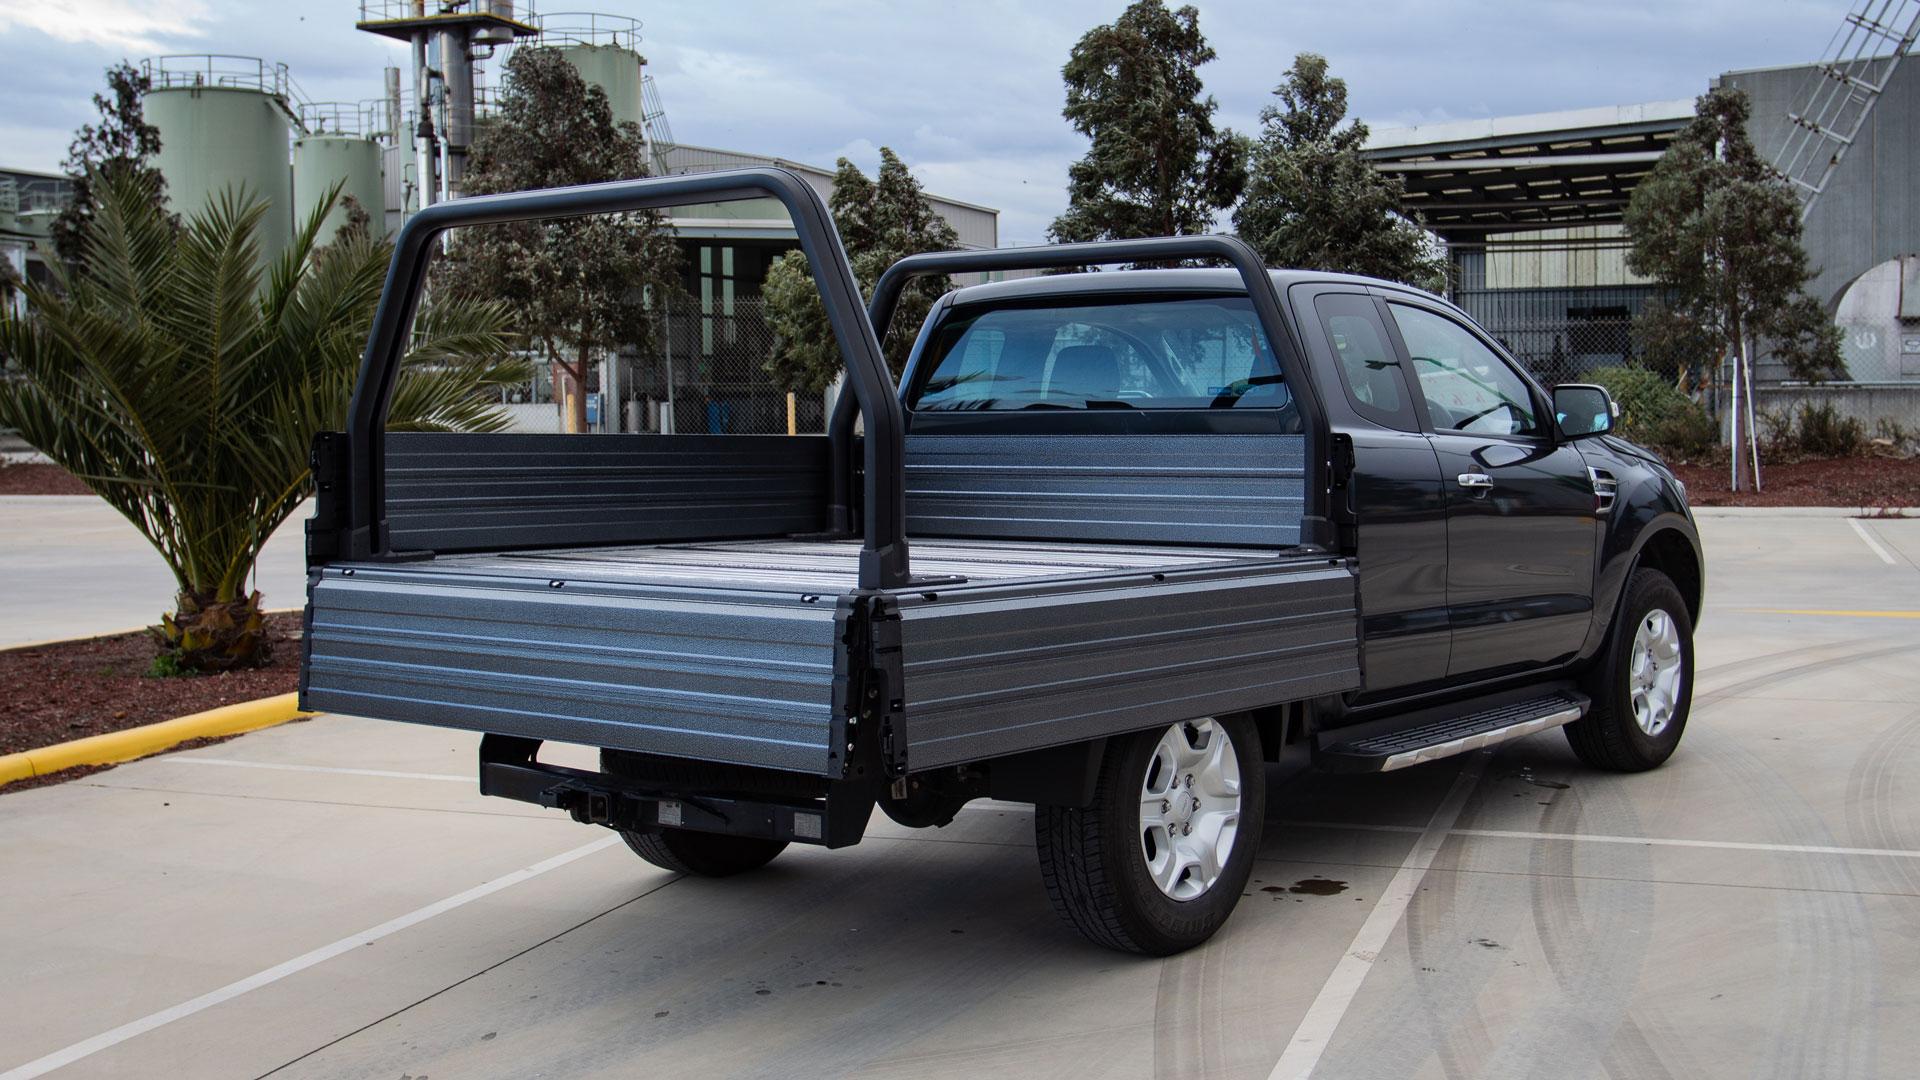 Ford Ranger SUB alloyt tray with grey finish